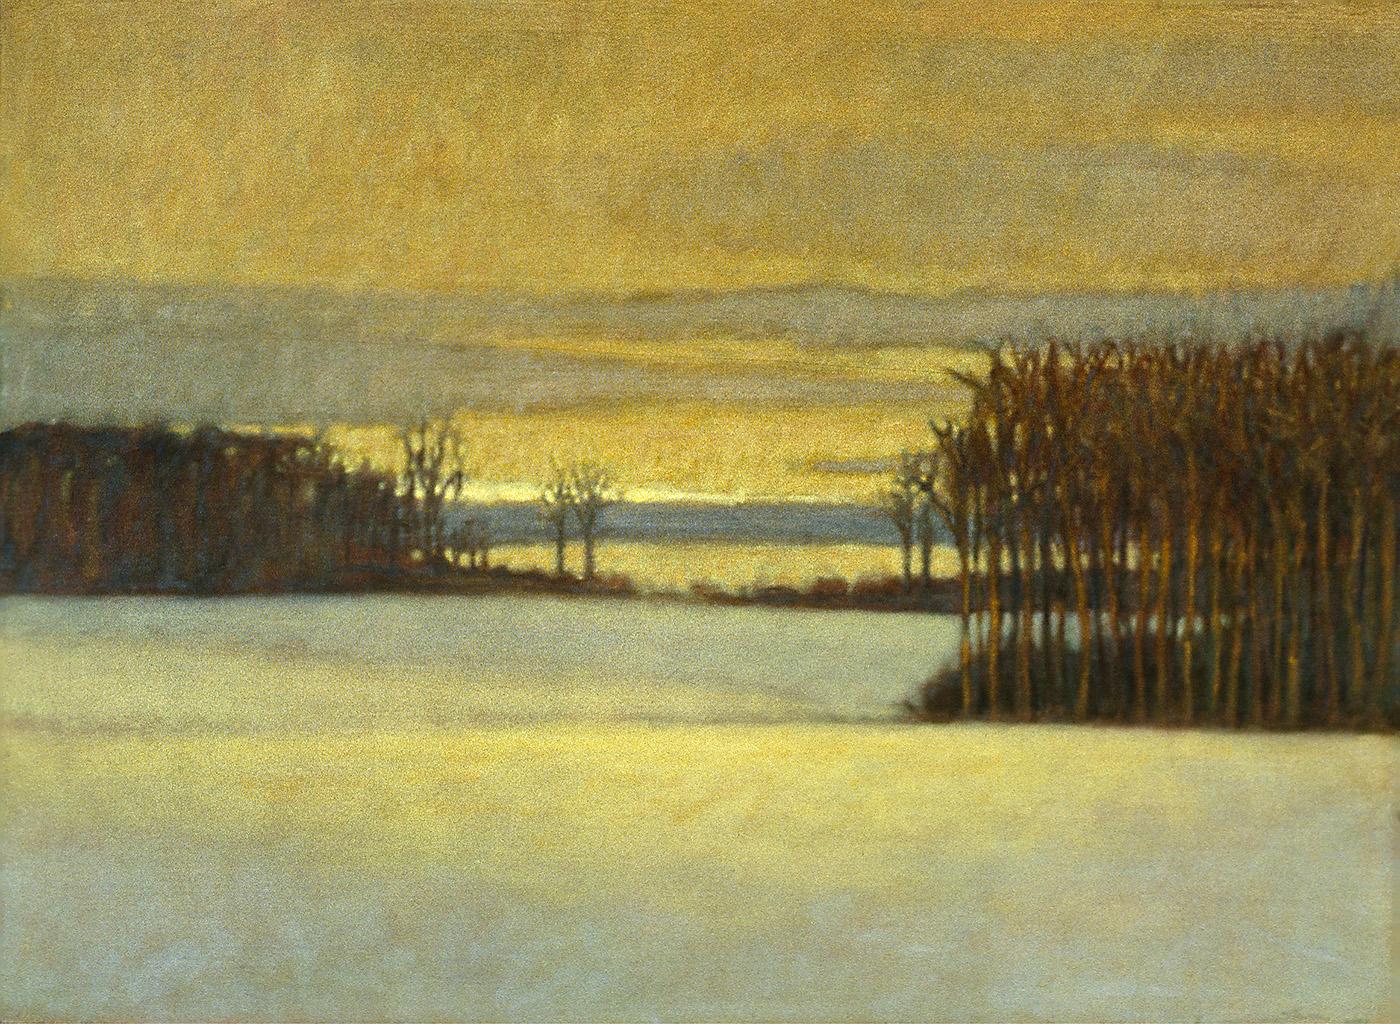 "Late November   | oil on canvas | 24 x 35"" | 2000"